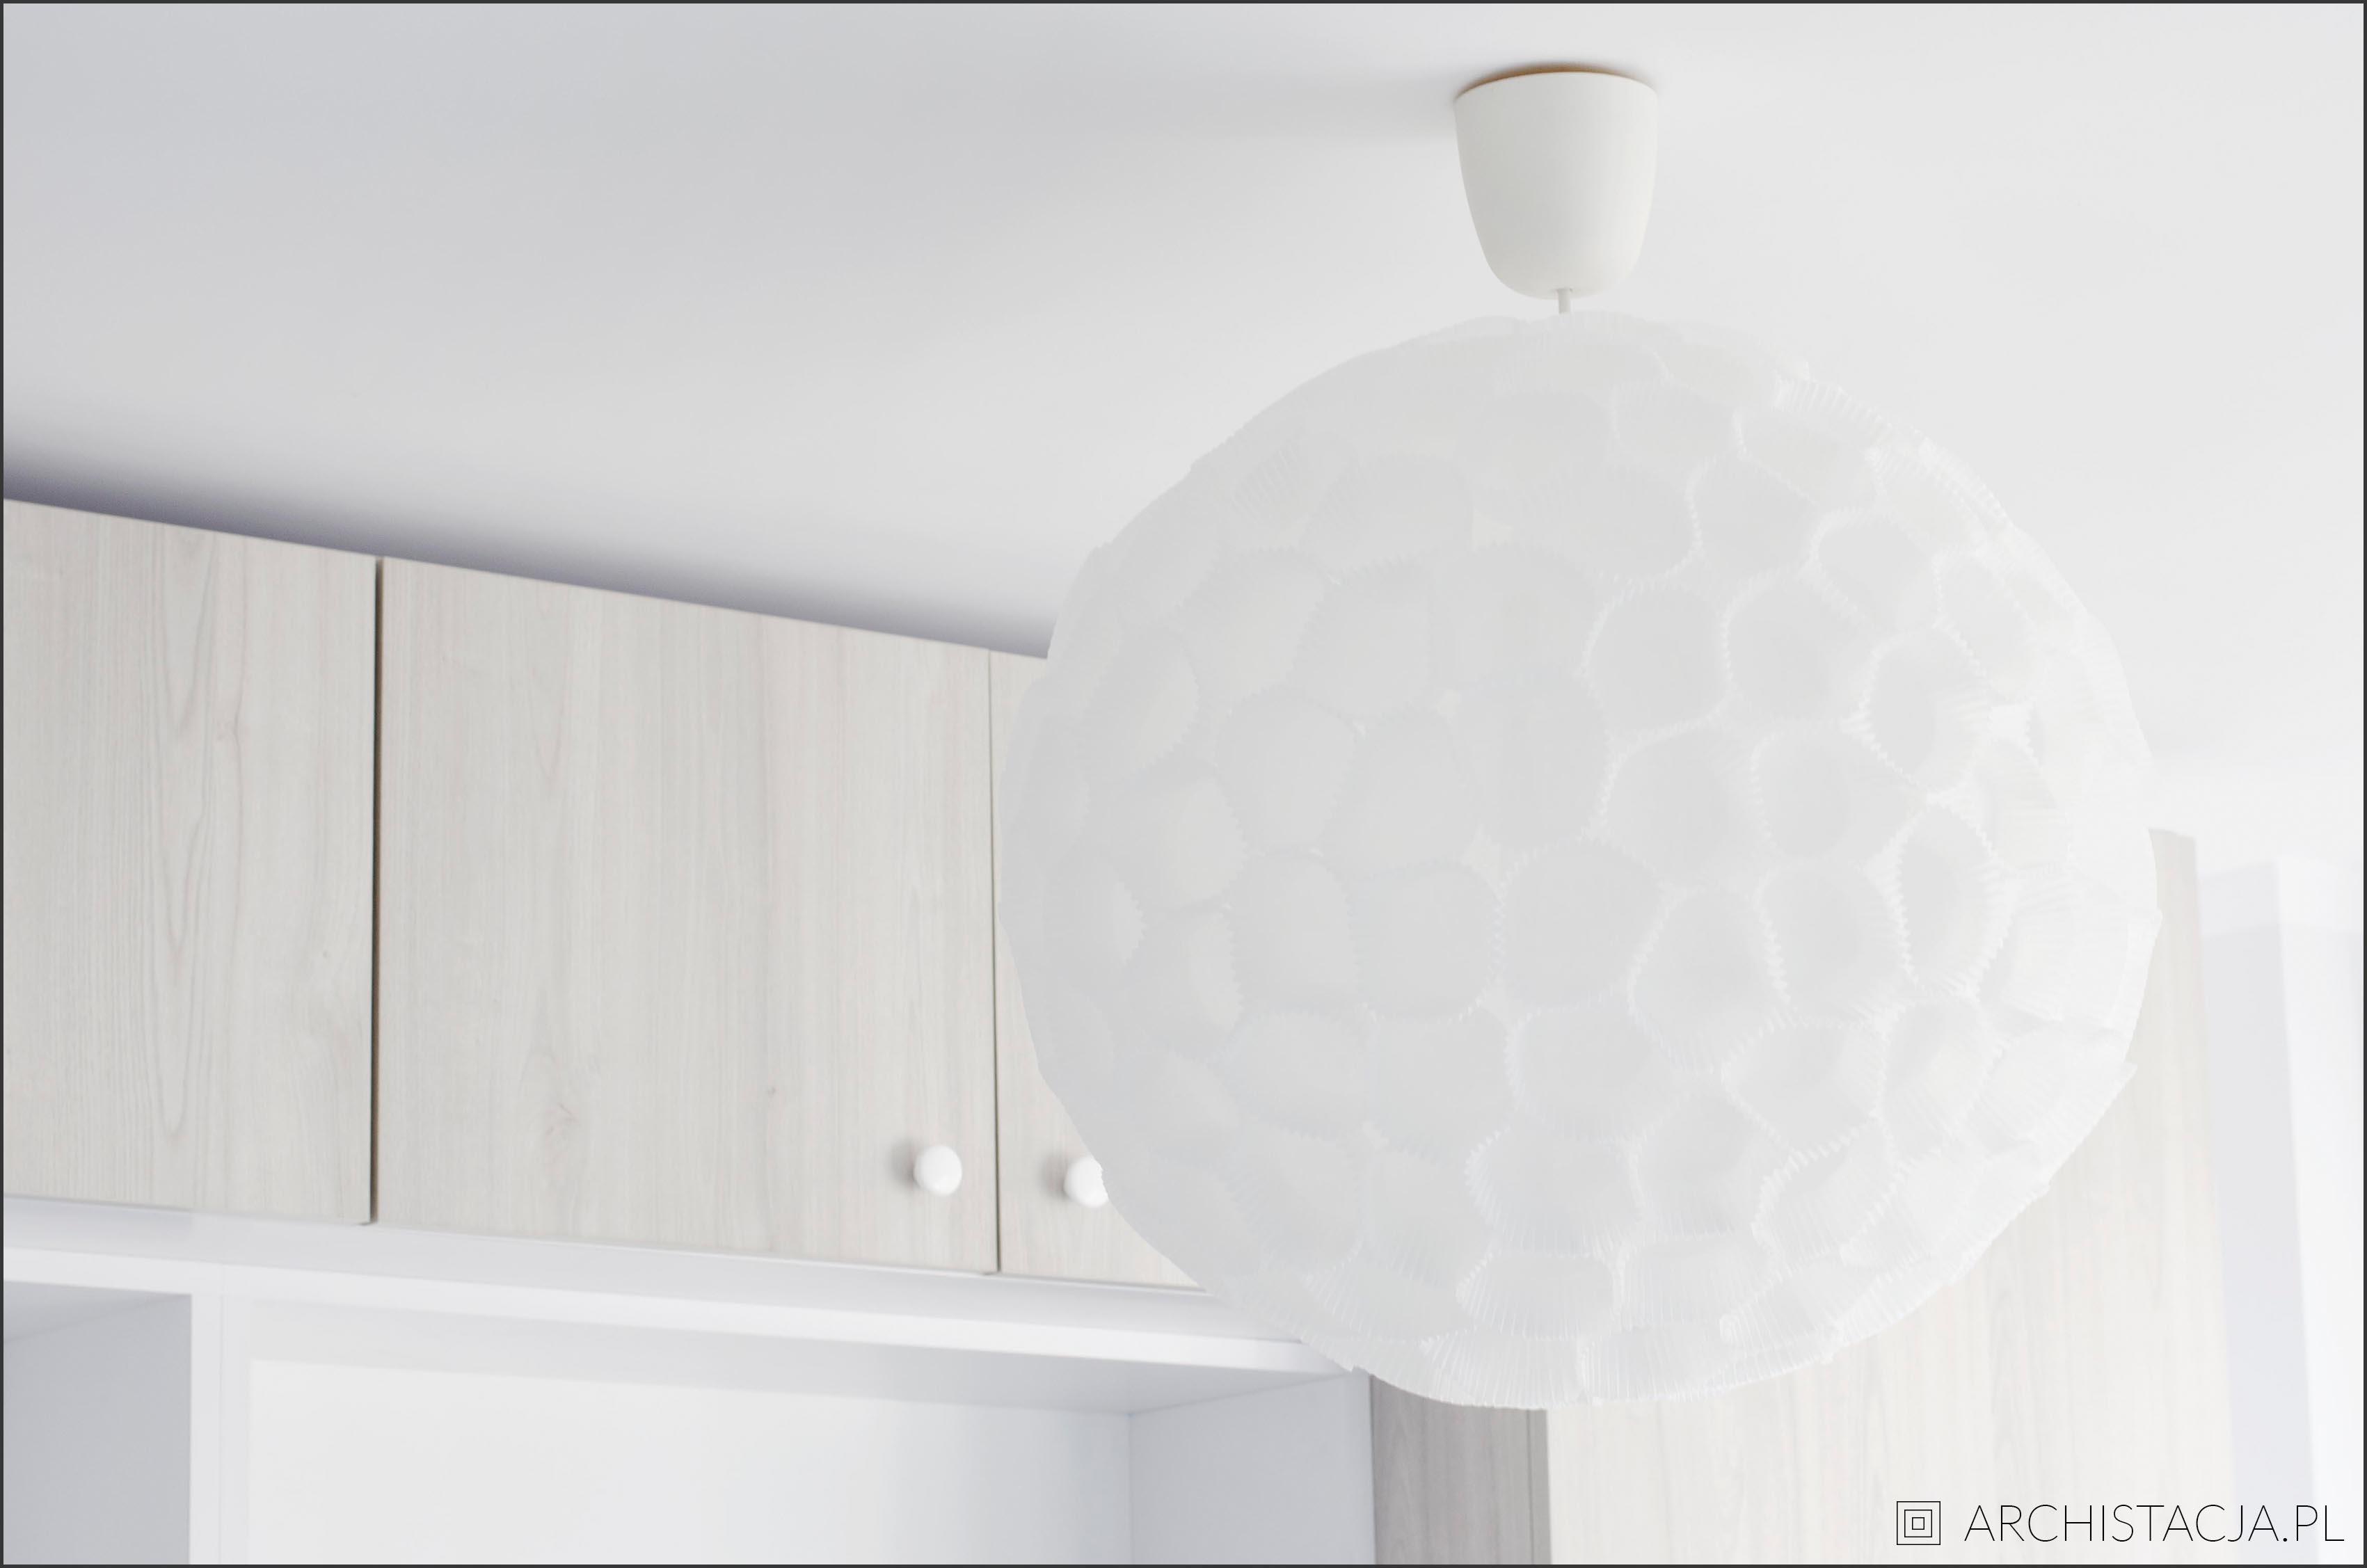 LAMPA Z PAPILOTEK DO BABECZEK DIY